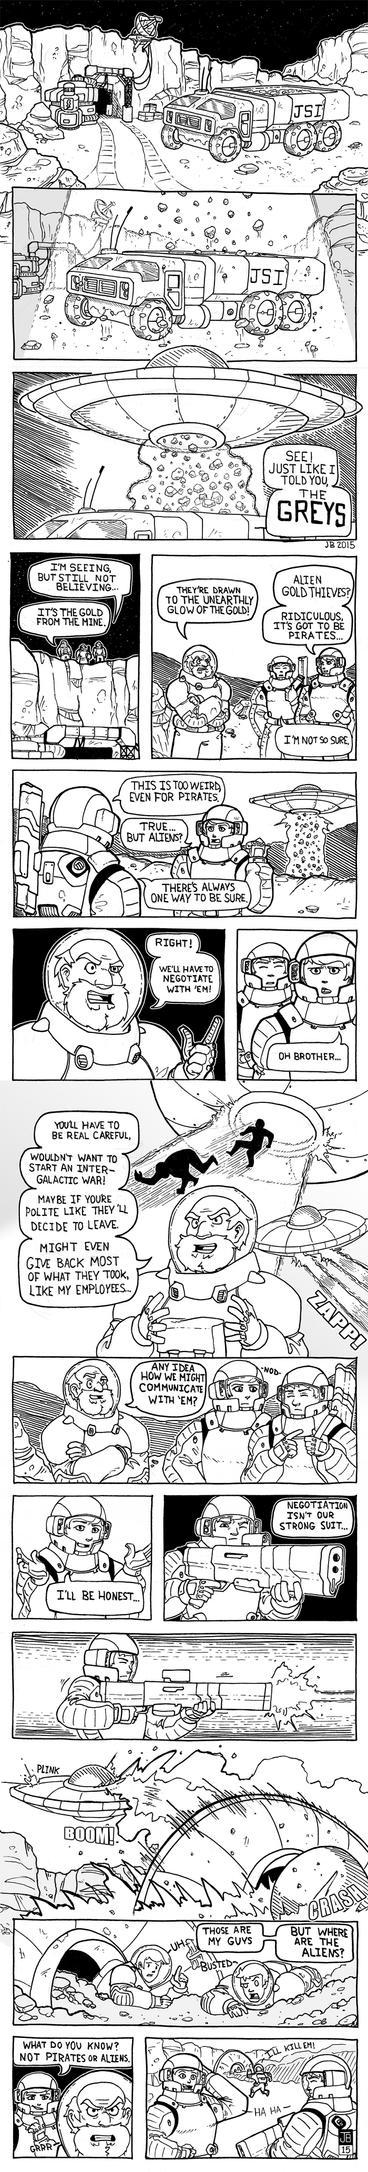 Crazy Joe's Aliens by Dadrick